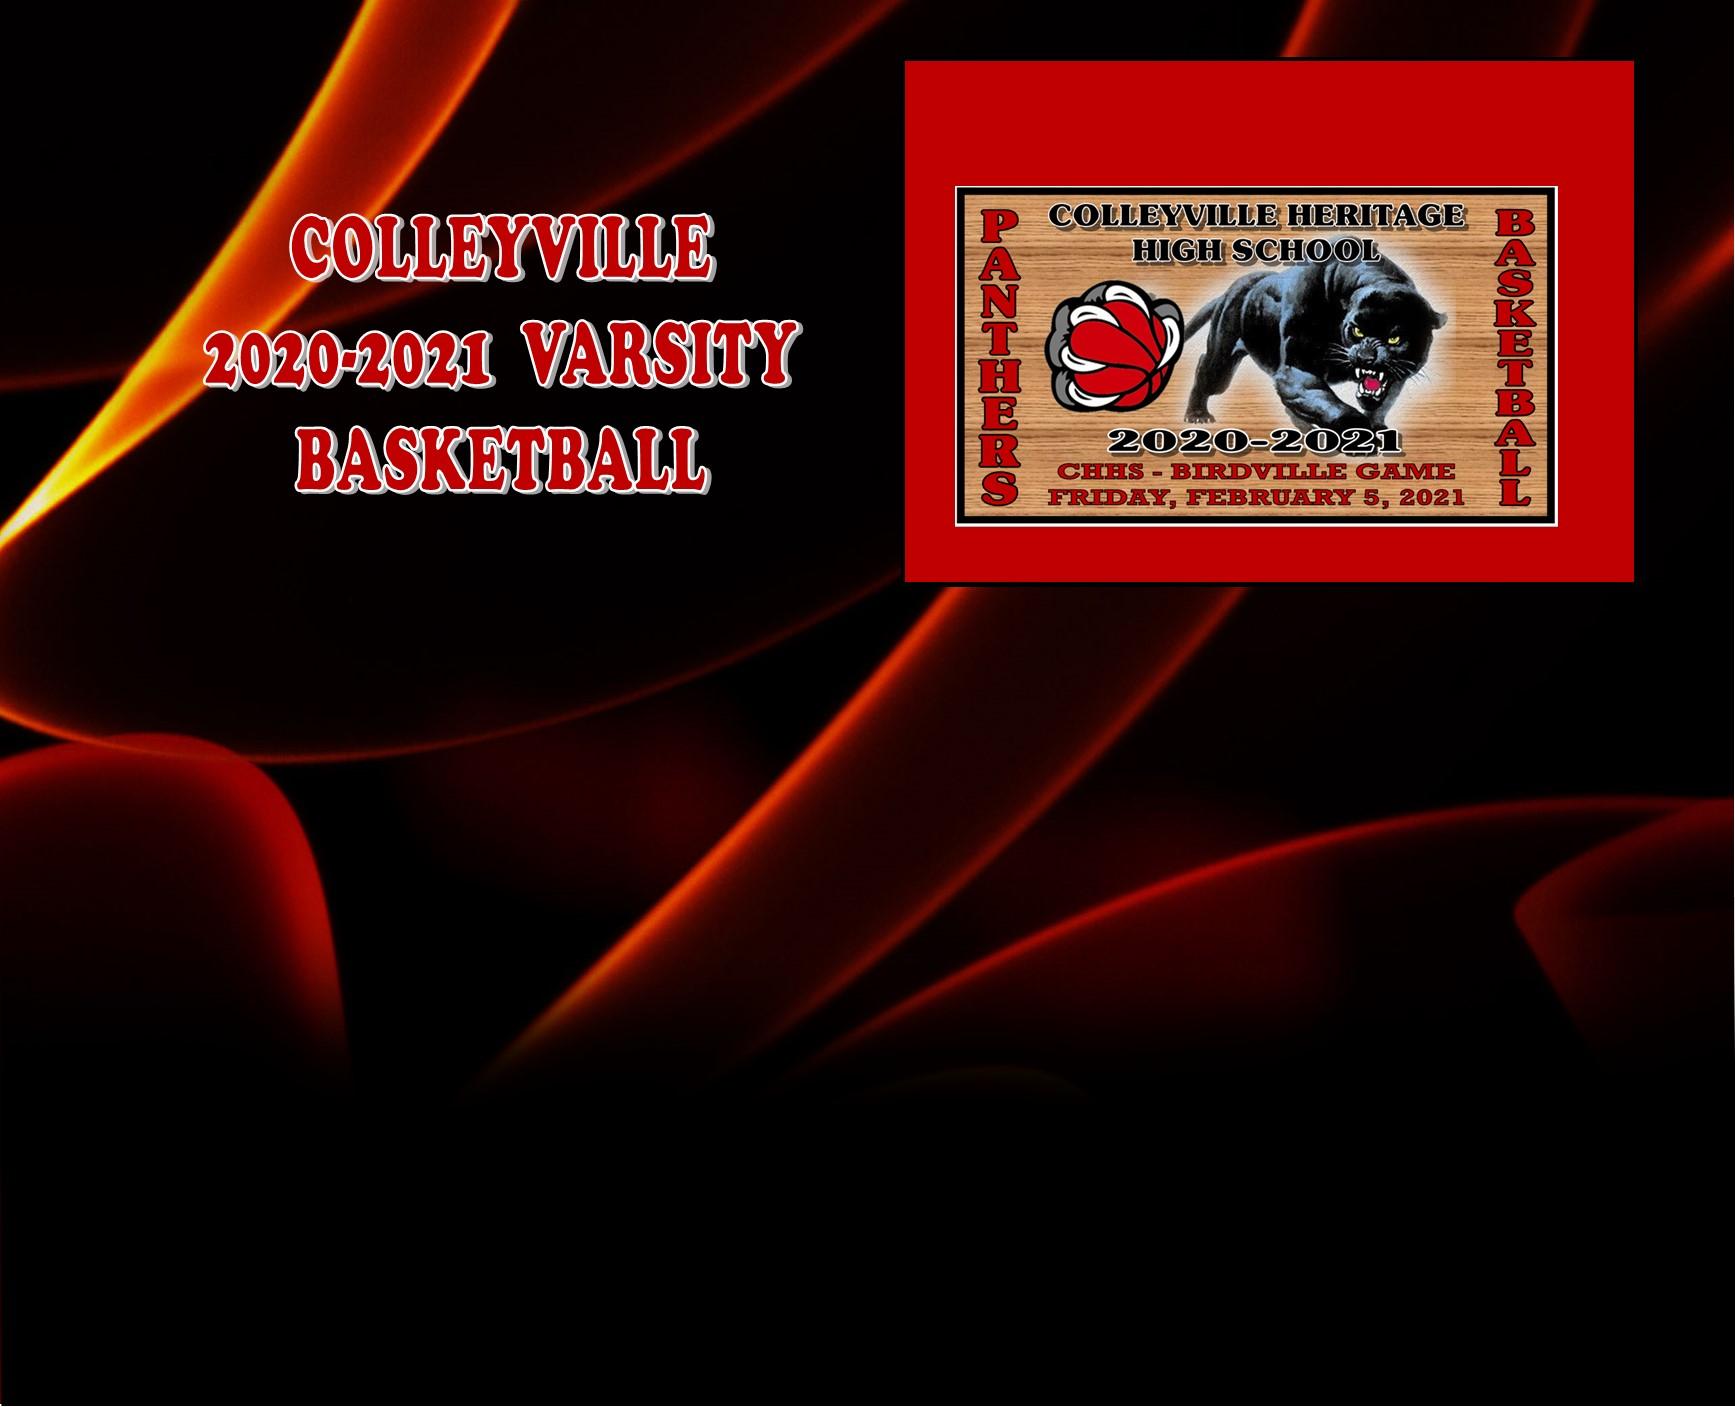 GCISD Basketball: Colleyville Panthers Lose Tough Game To Birdville Hawks 39-48